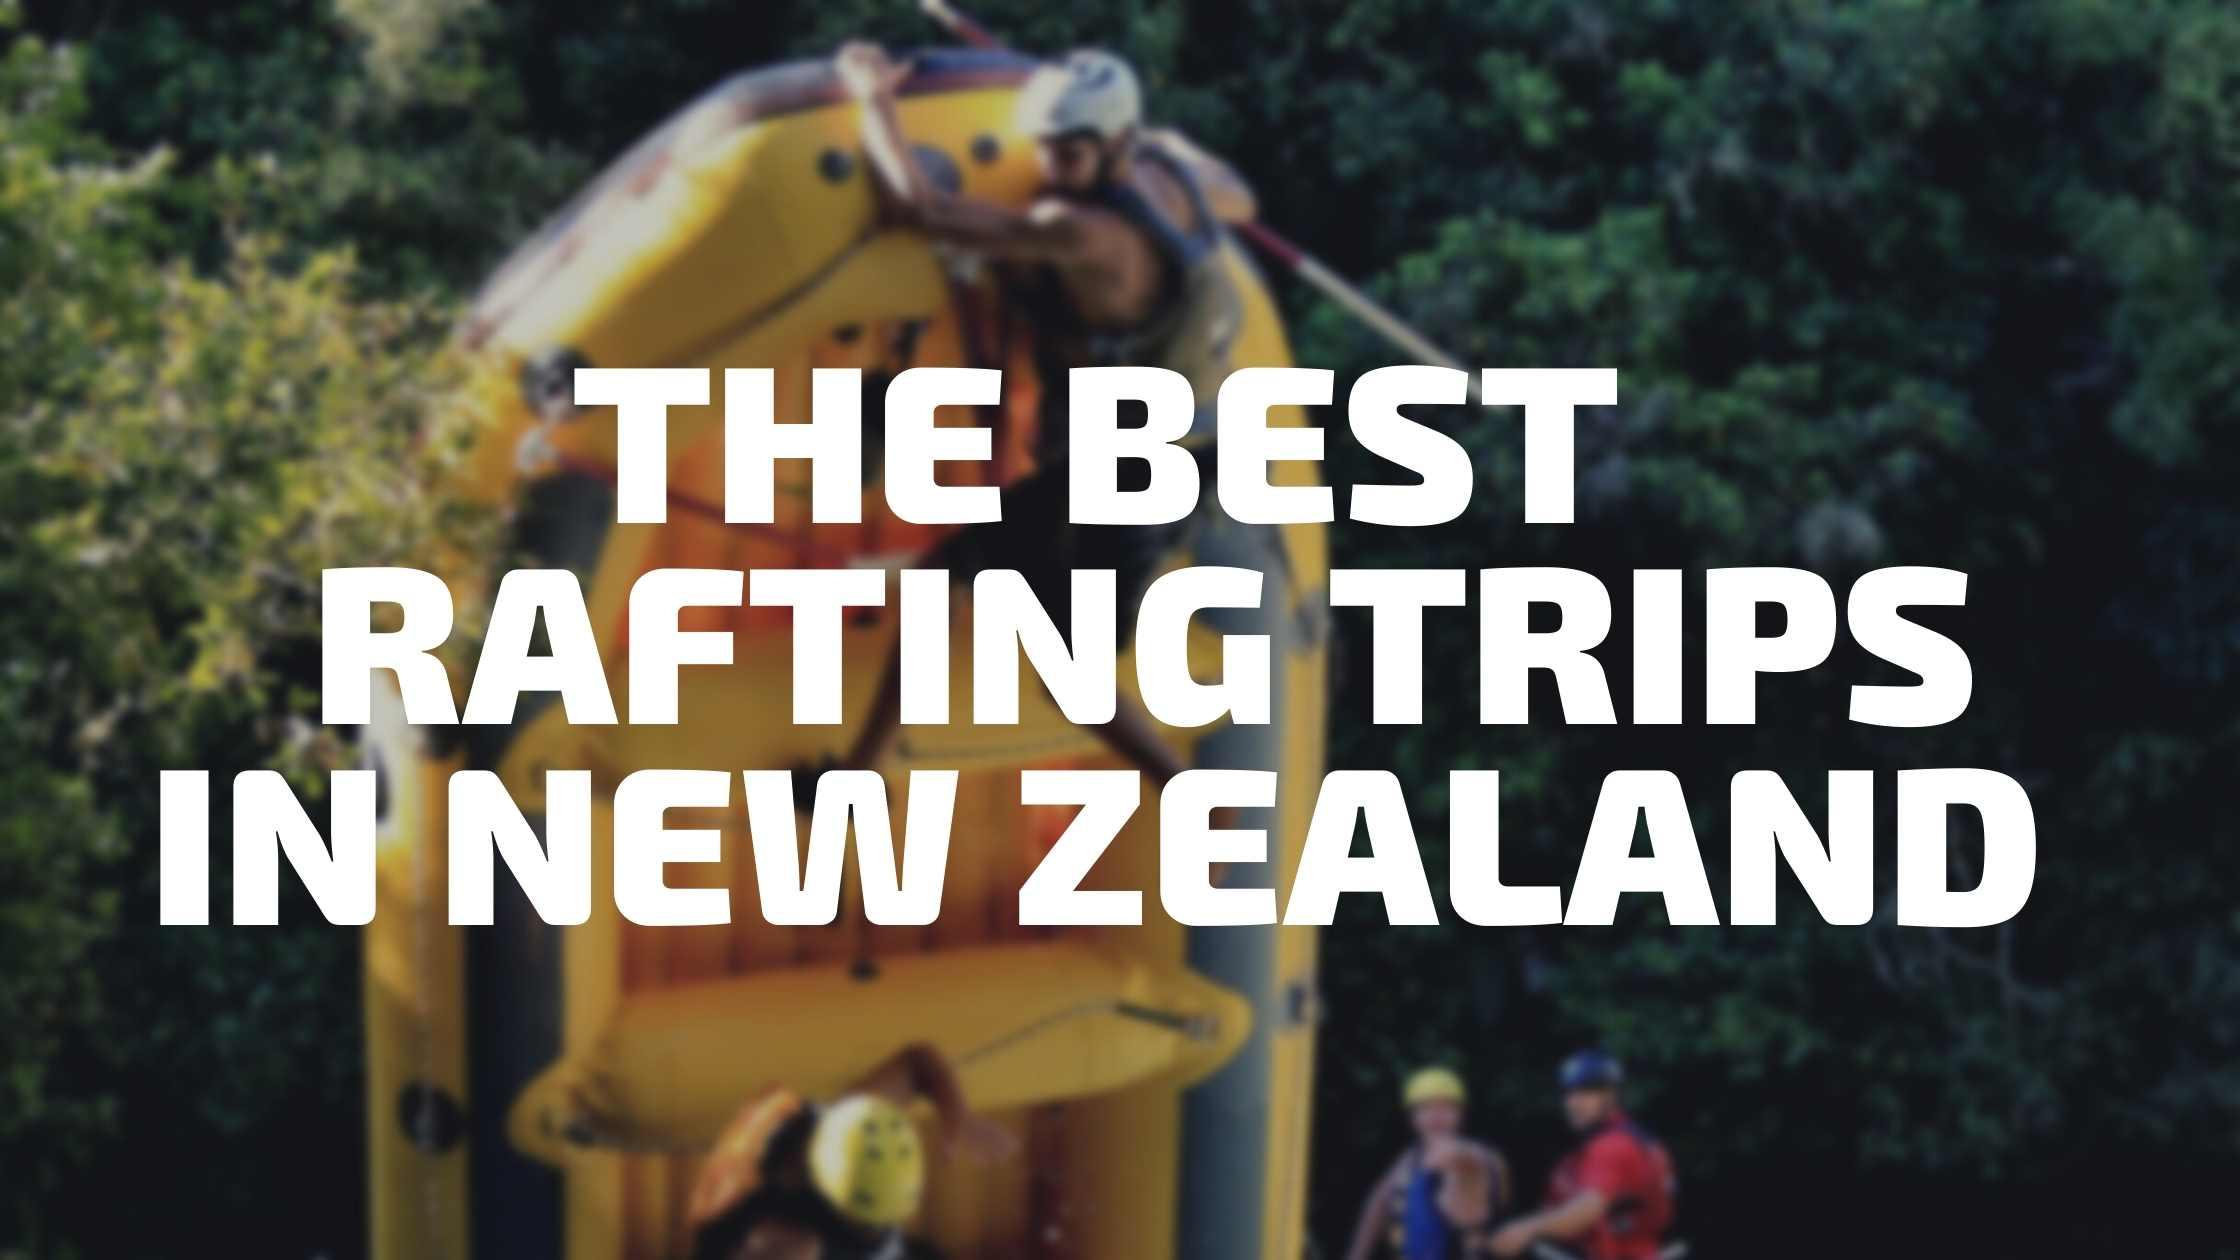 Best Rafting Trips in New Zealand